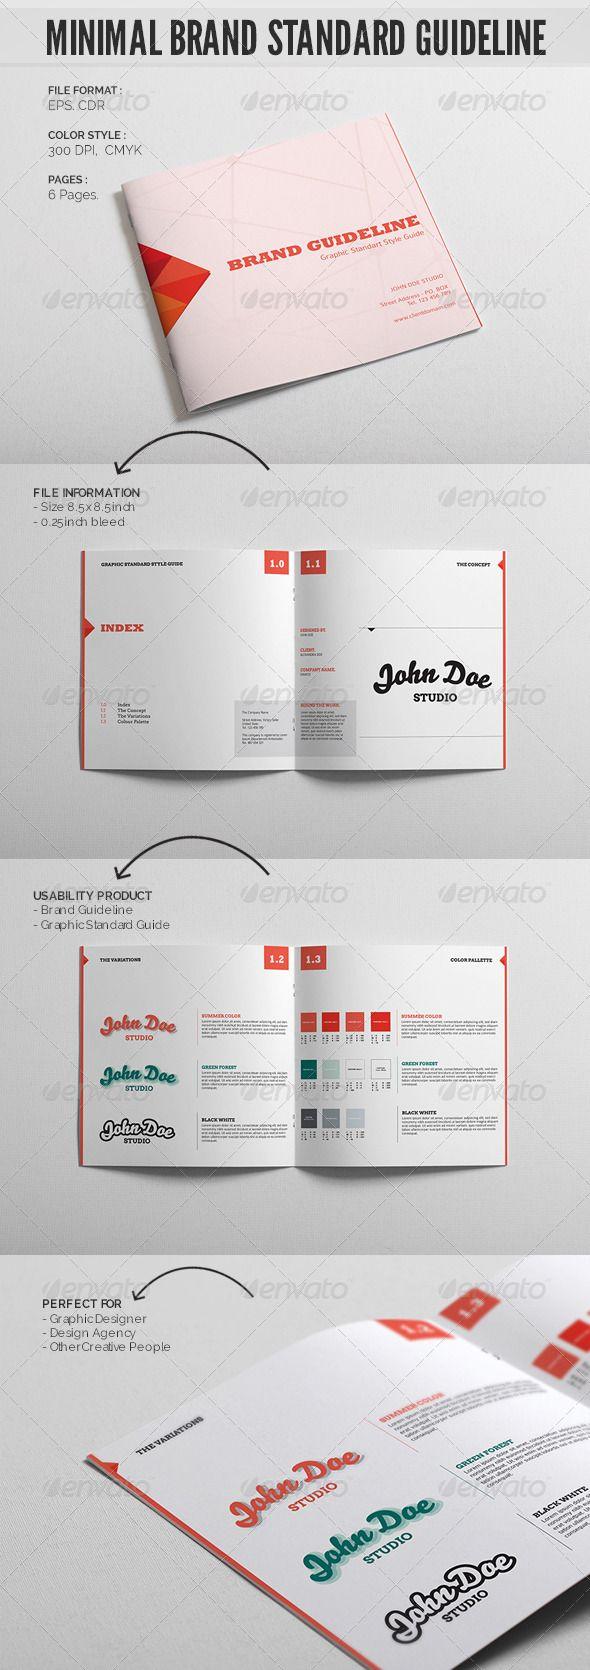 Minimal Brand Standard Guideline Template Brand Guidelines Template Brand Guidelines Book Brand Book